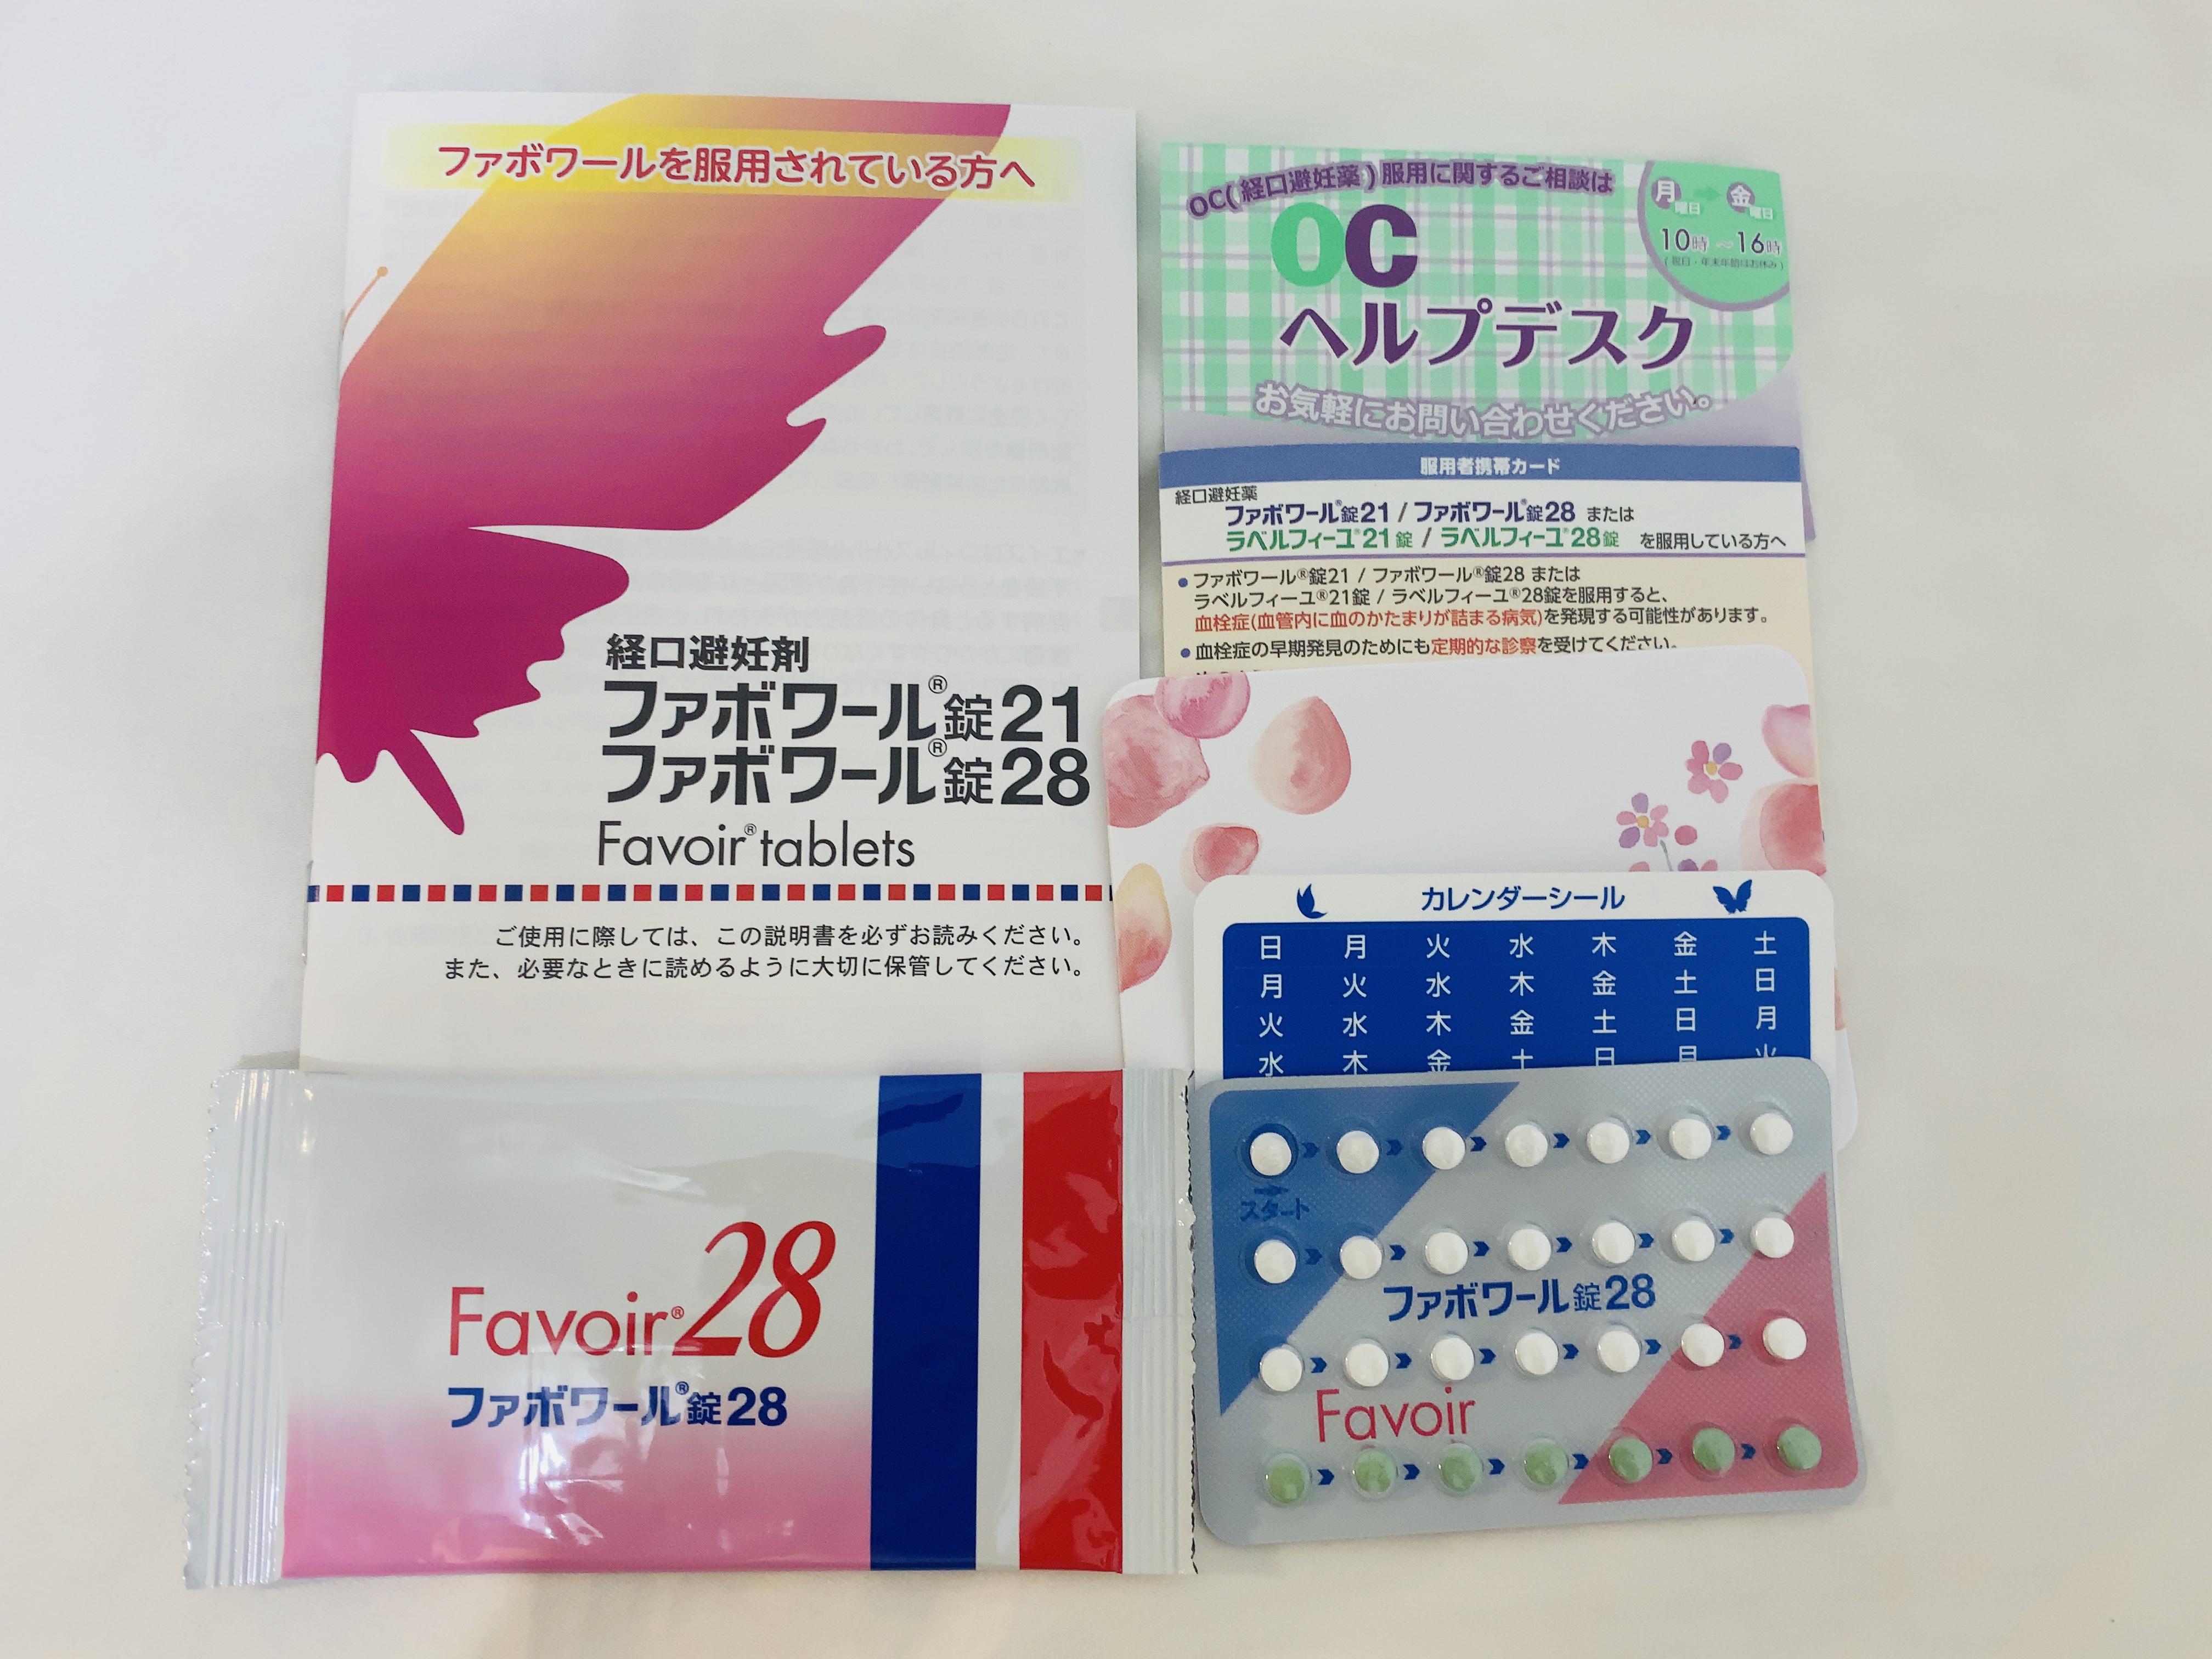 3EF43D21-92CC-4CC6-B194-0AF28B13CD71